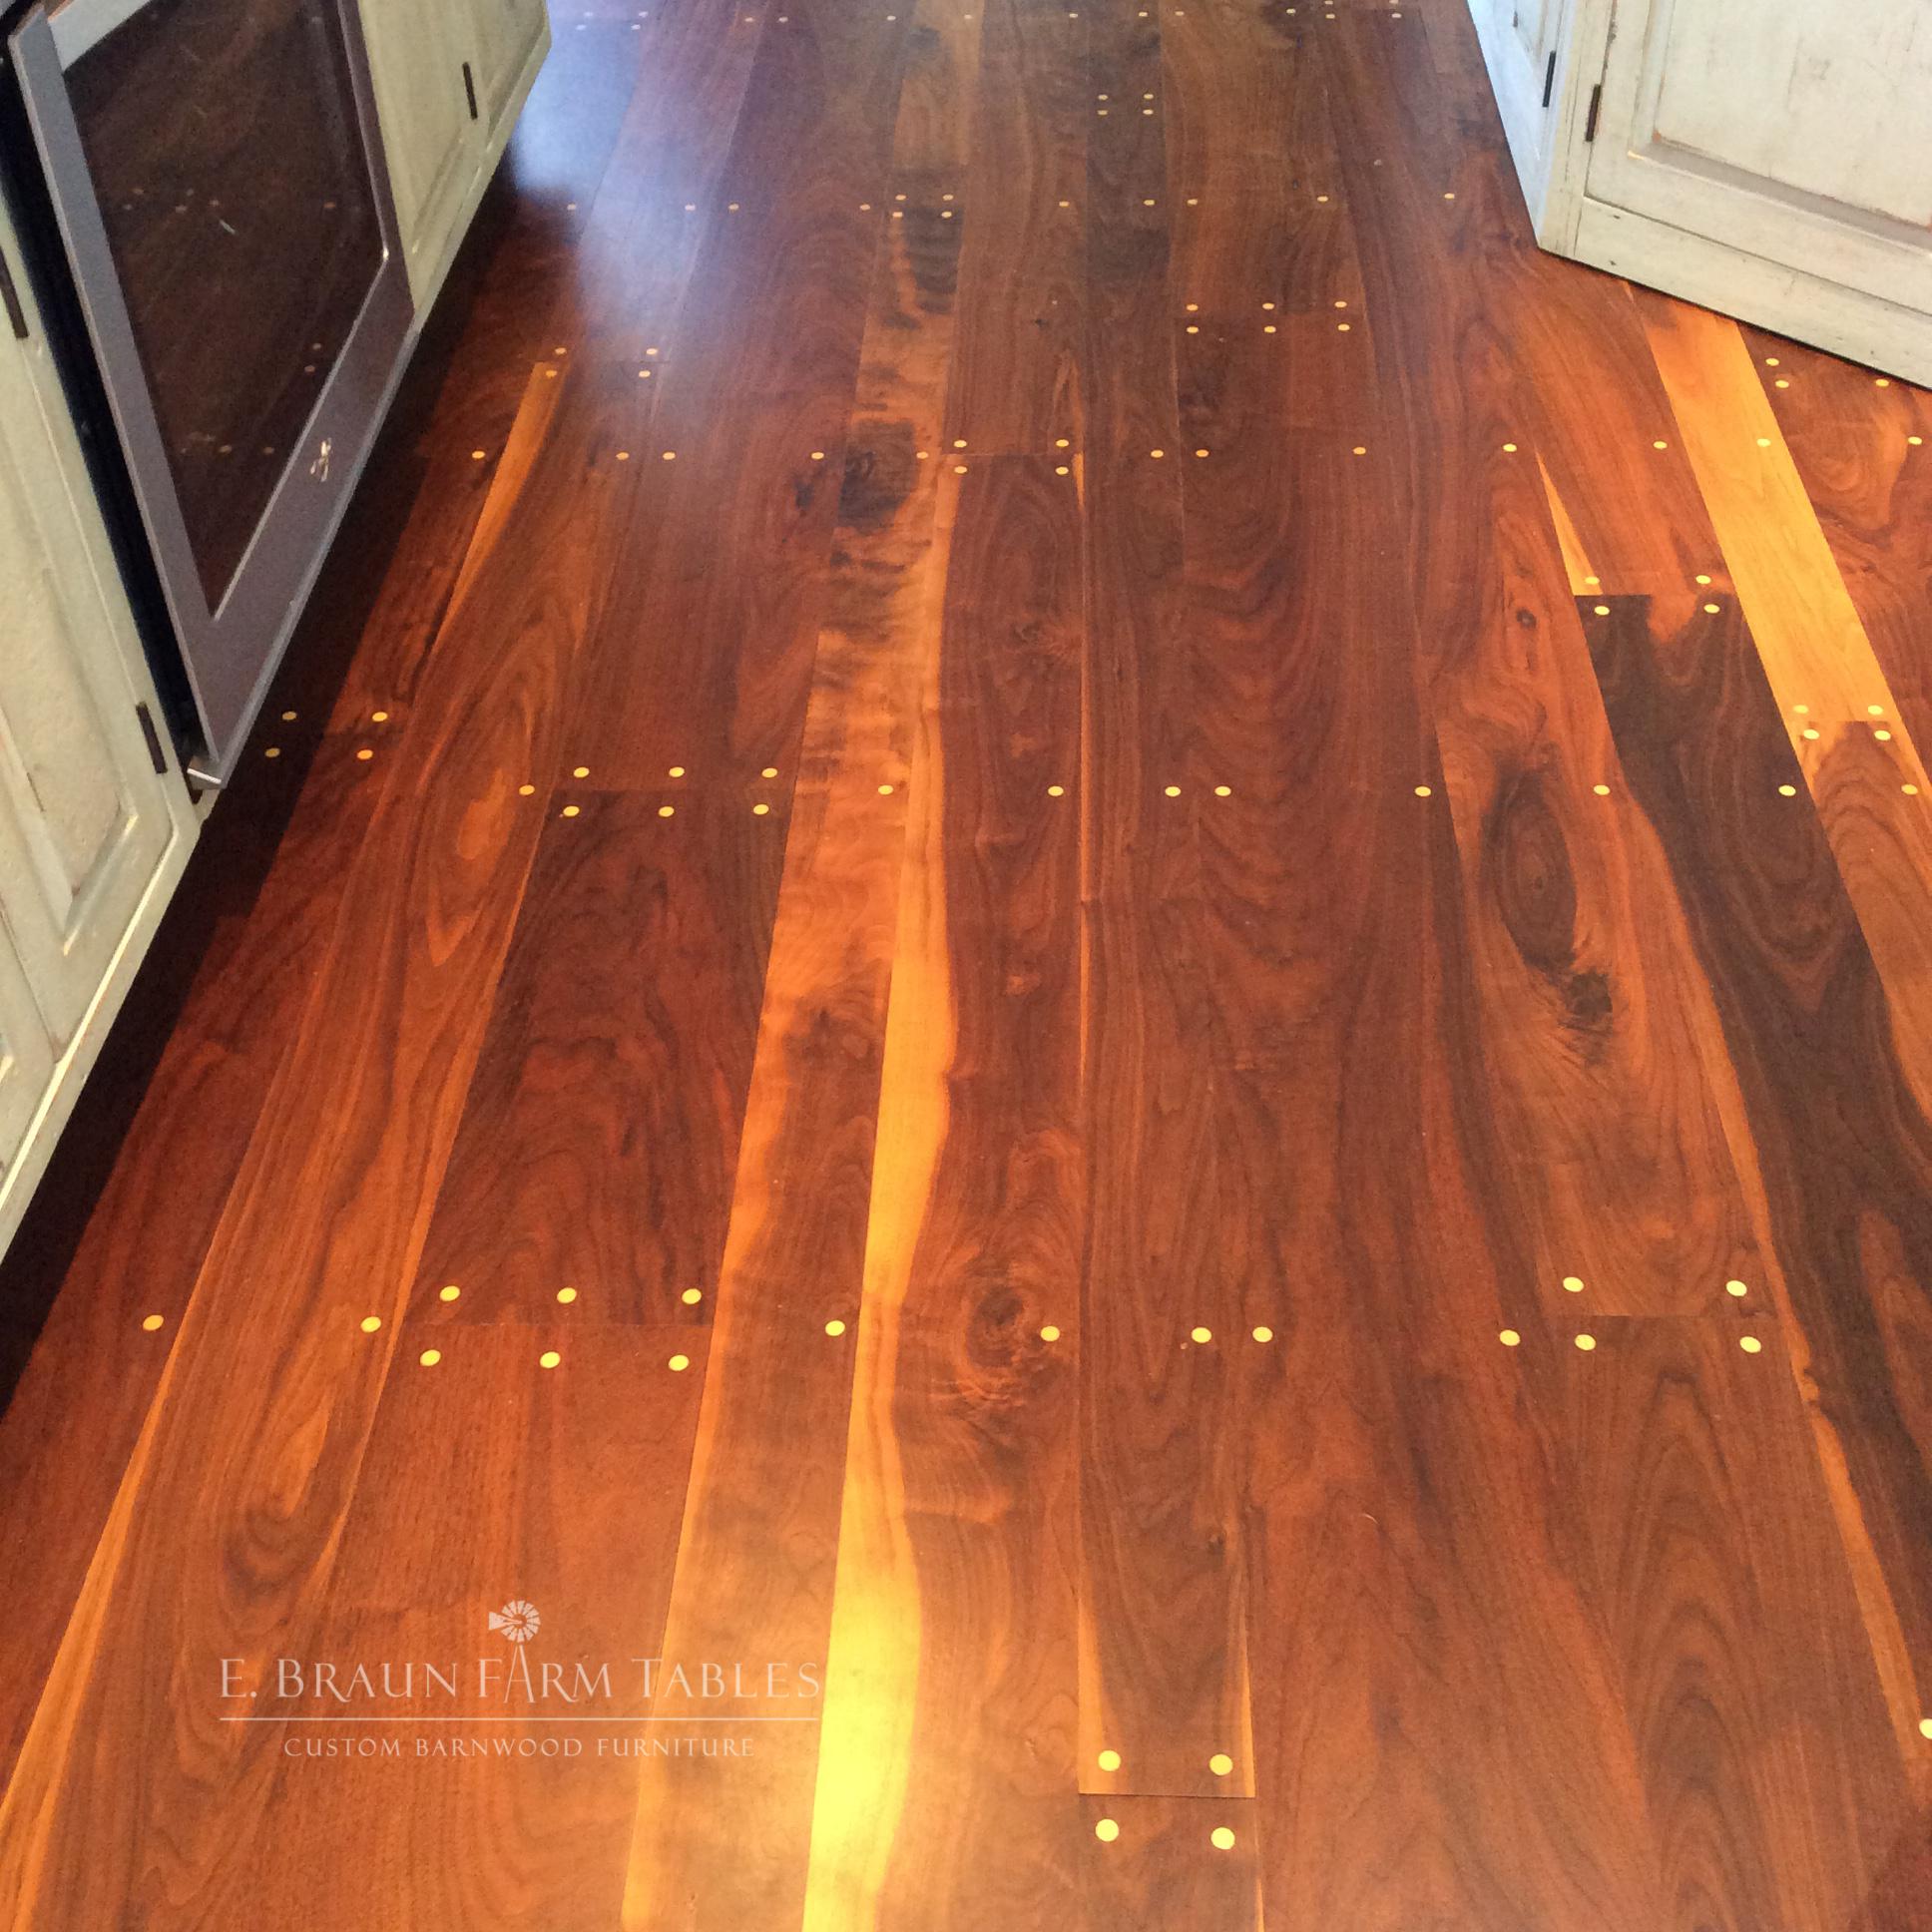 Black Walnut Flooring with Cherry Wood Pegs